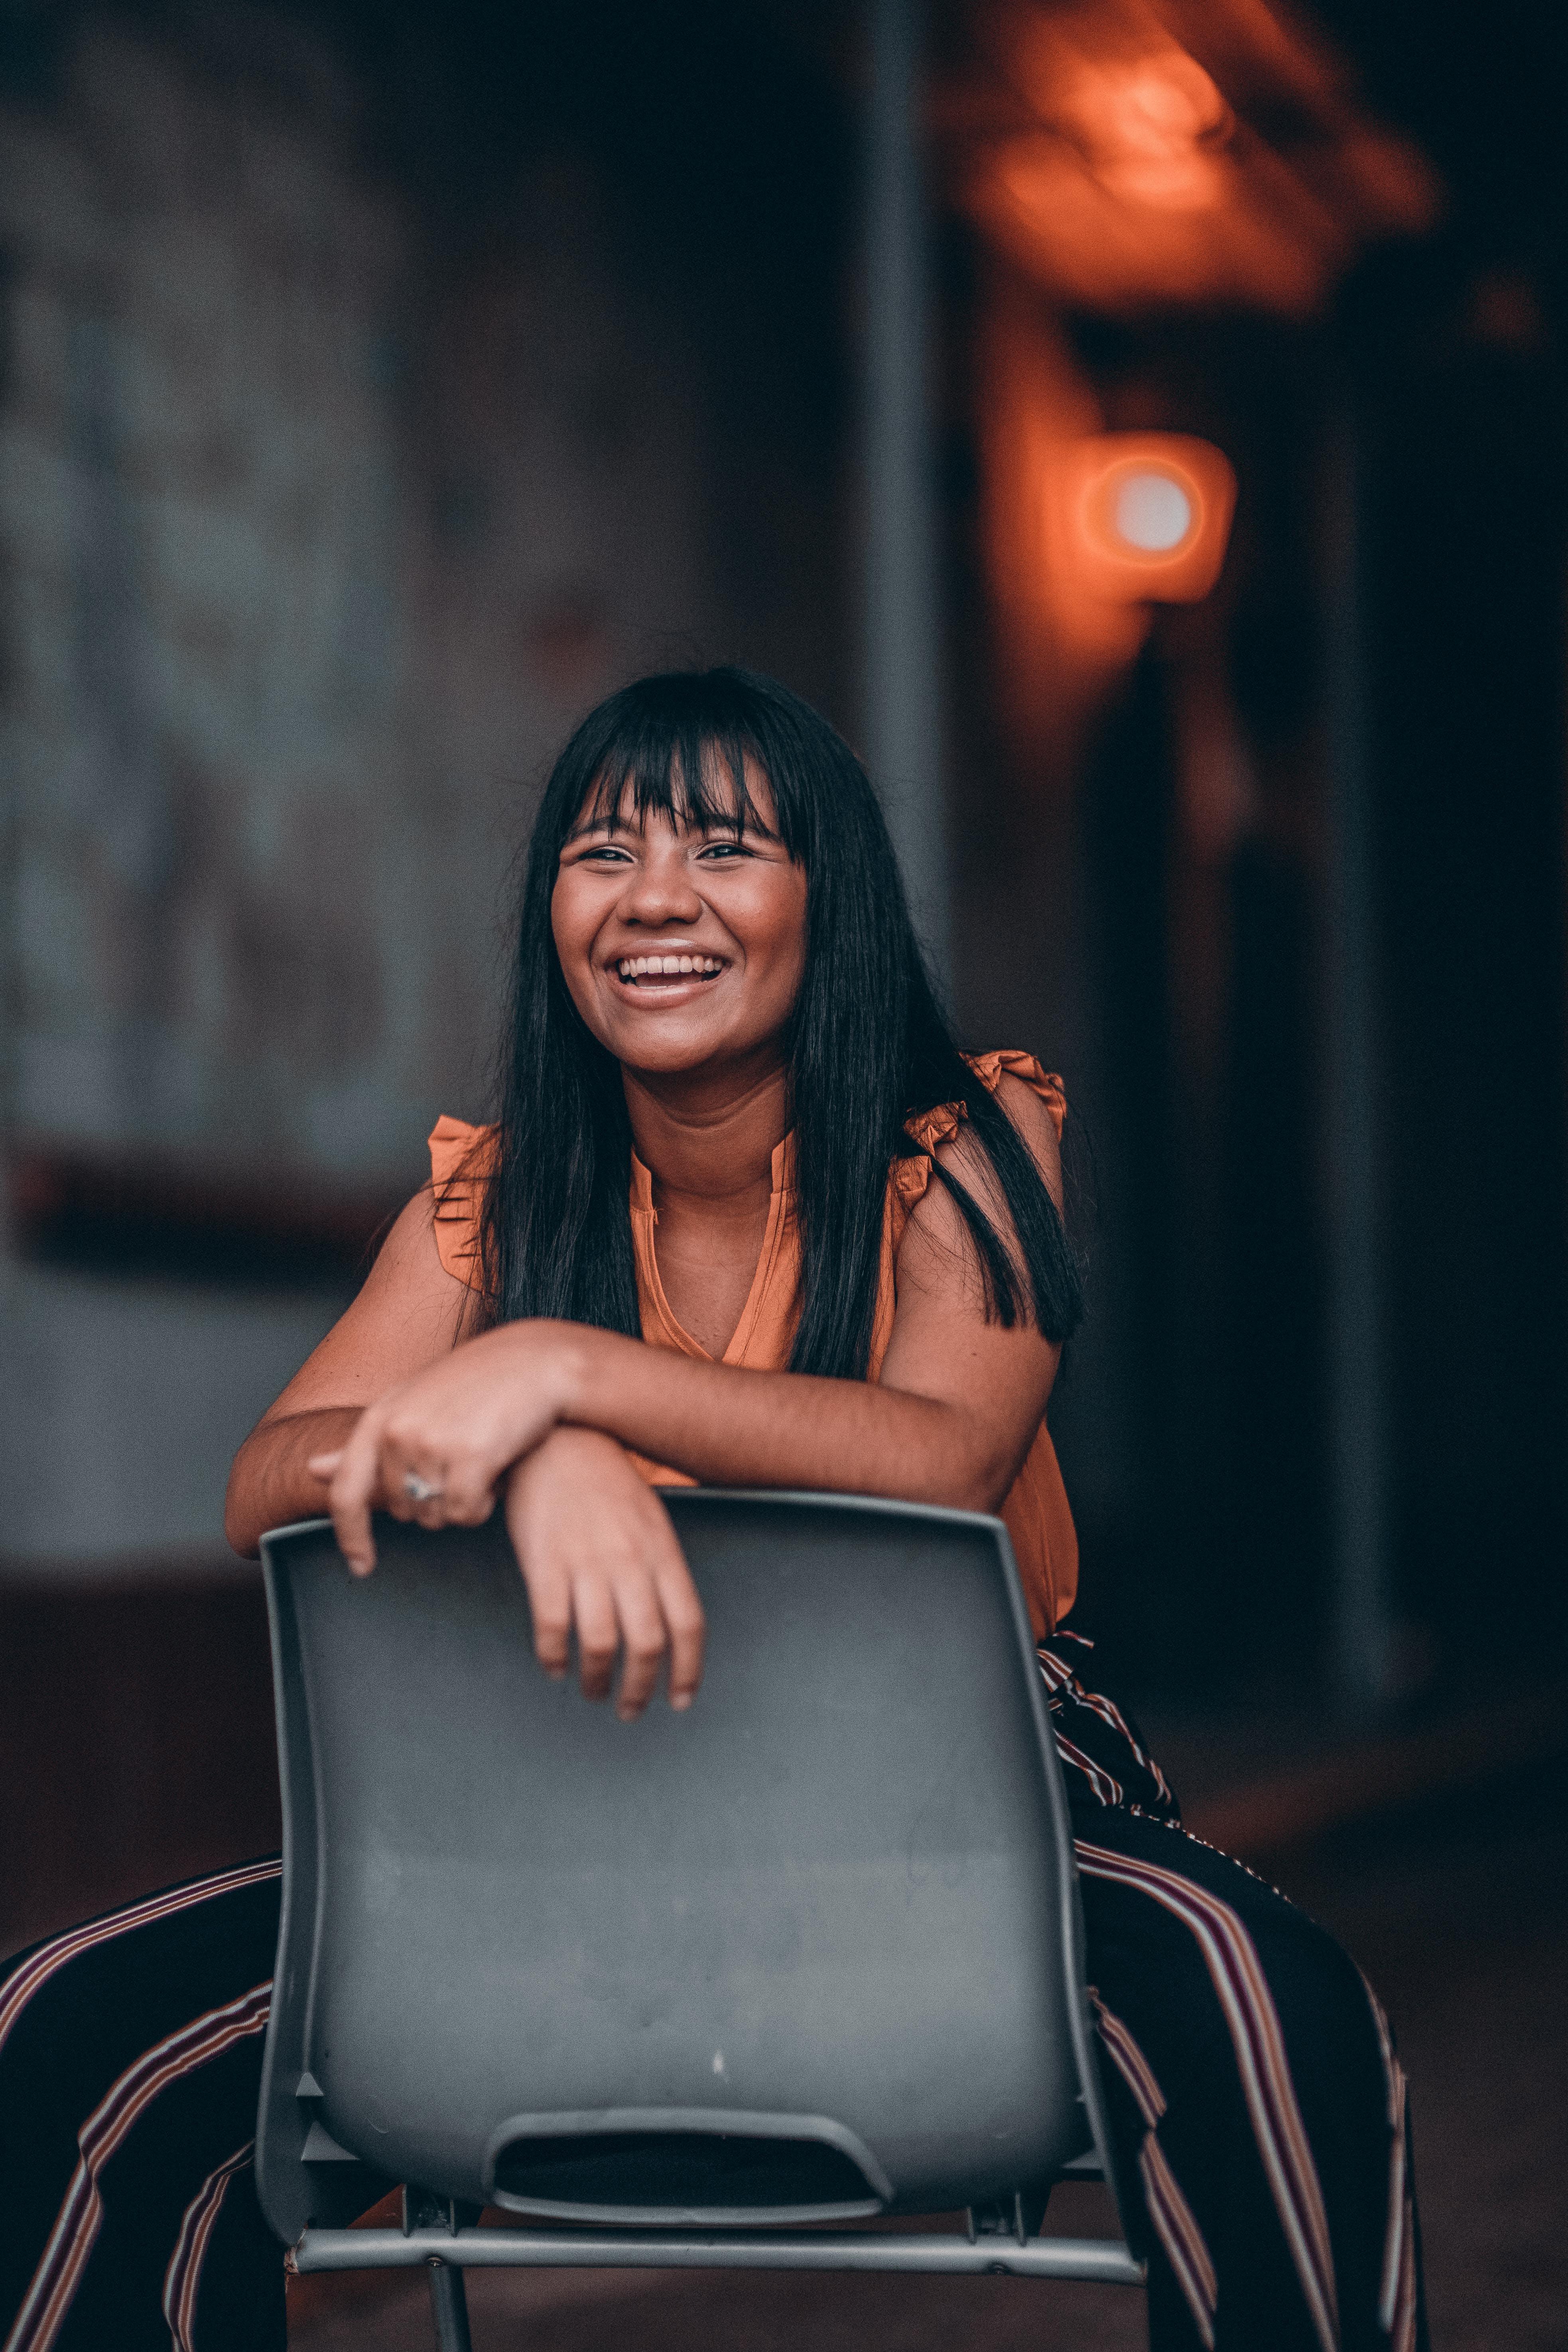 Woman Sitting on Gray Plastic Chair